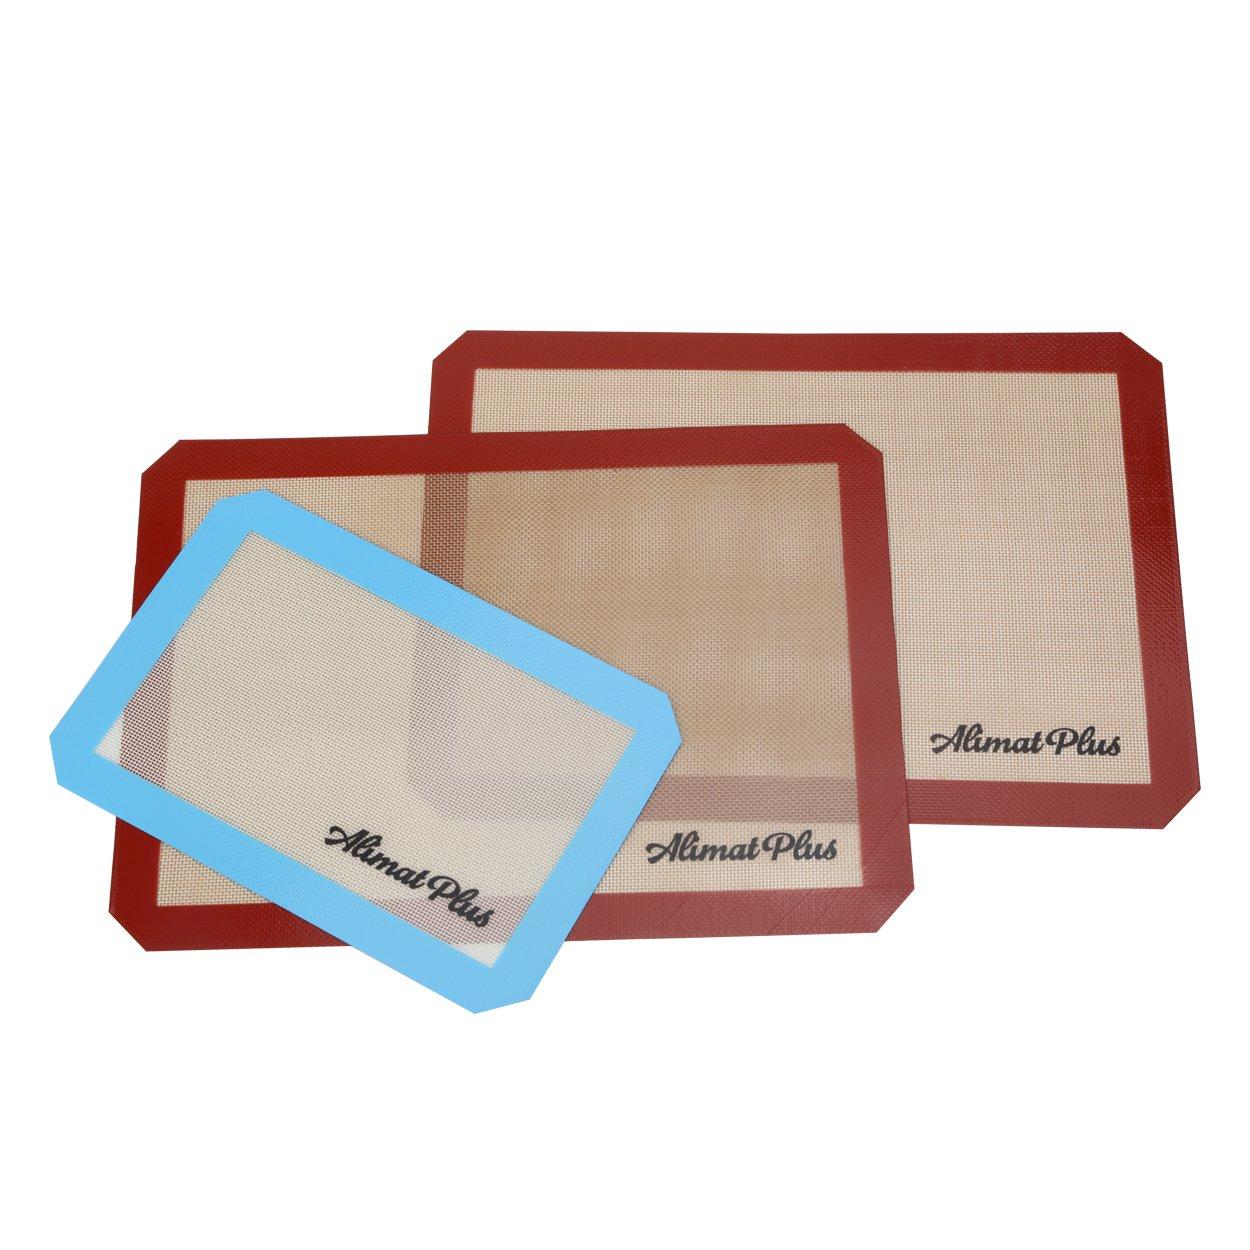 Alimat Plus Silicon Baking mat Cookie Sheet Non Stick Dishwasher Safe Reusable by Alimat Plus (Image #8)